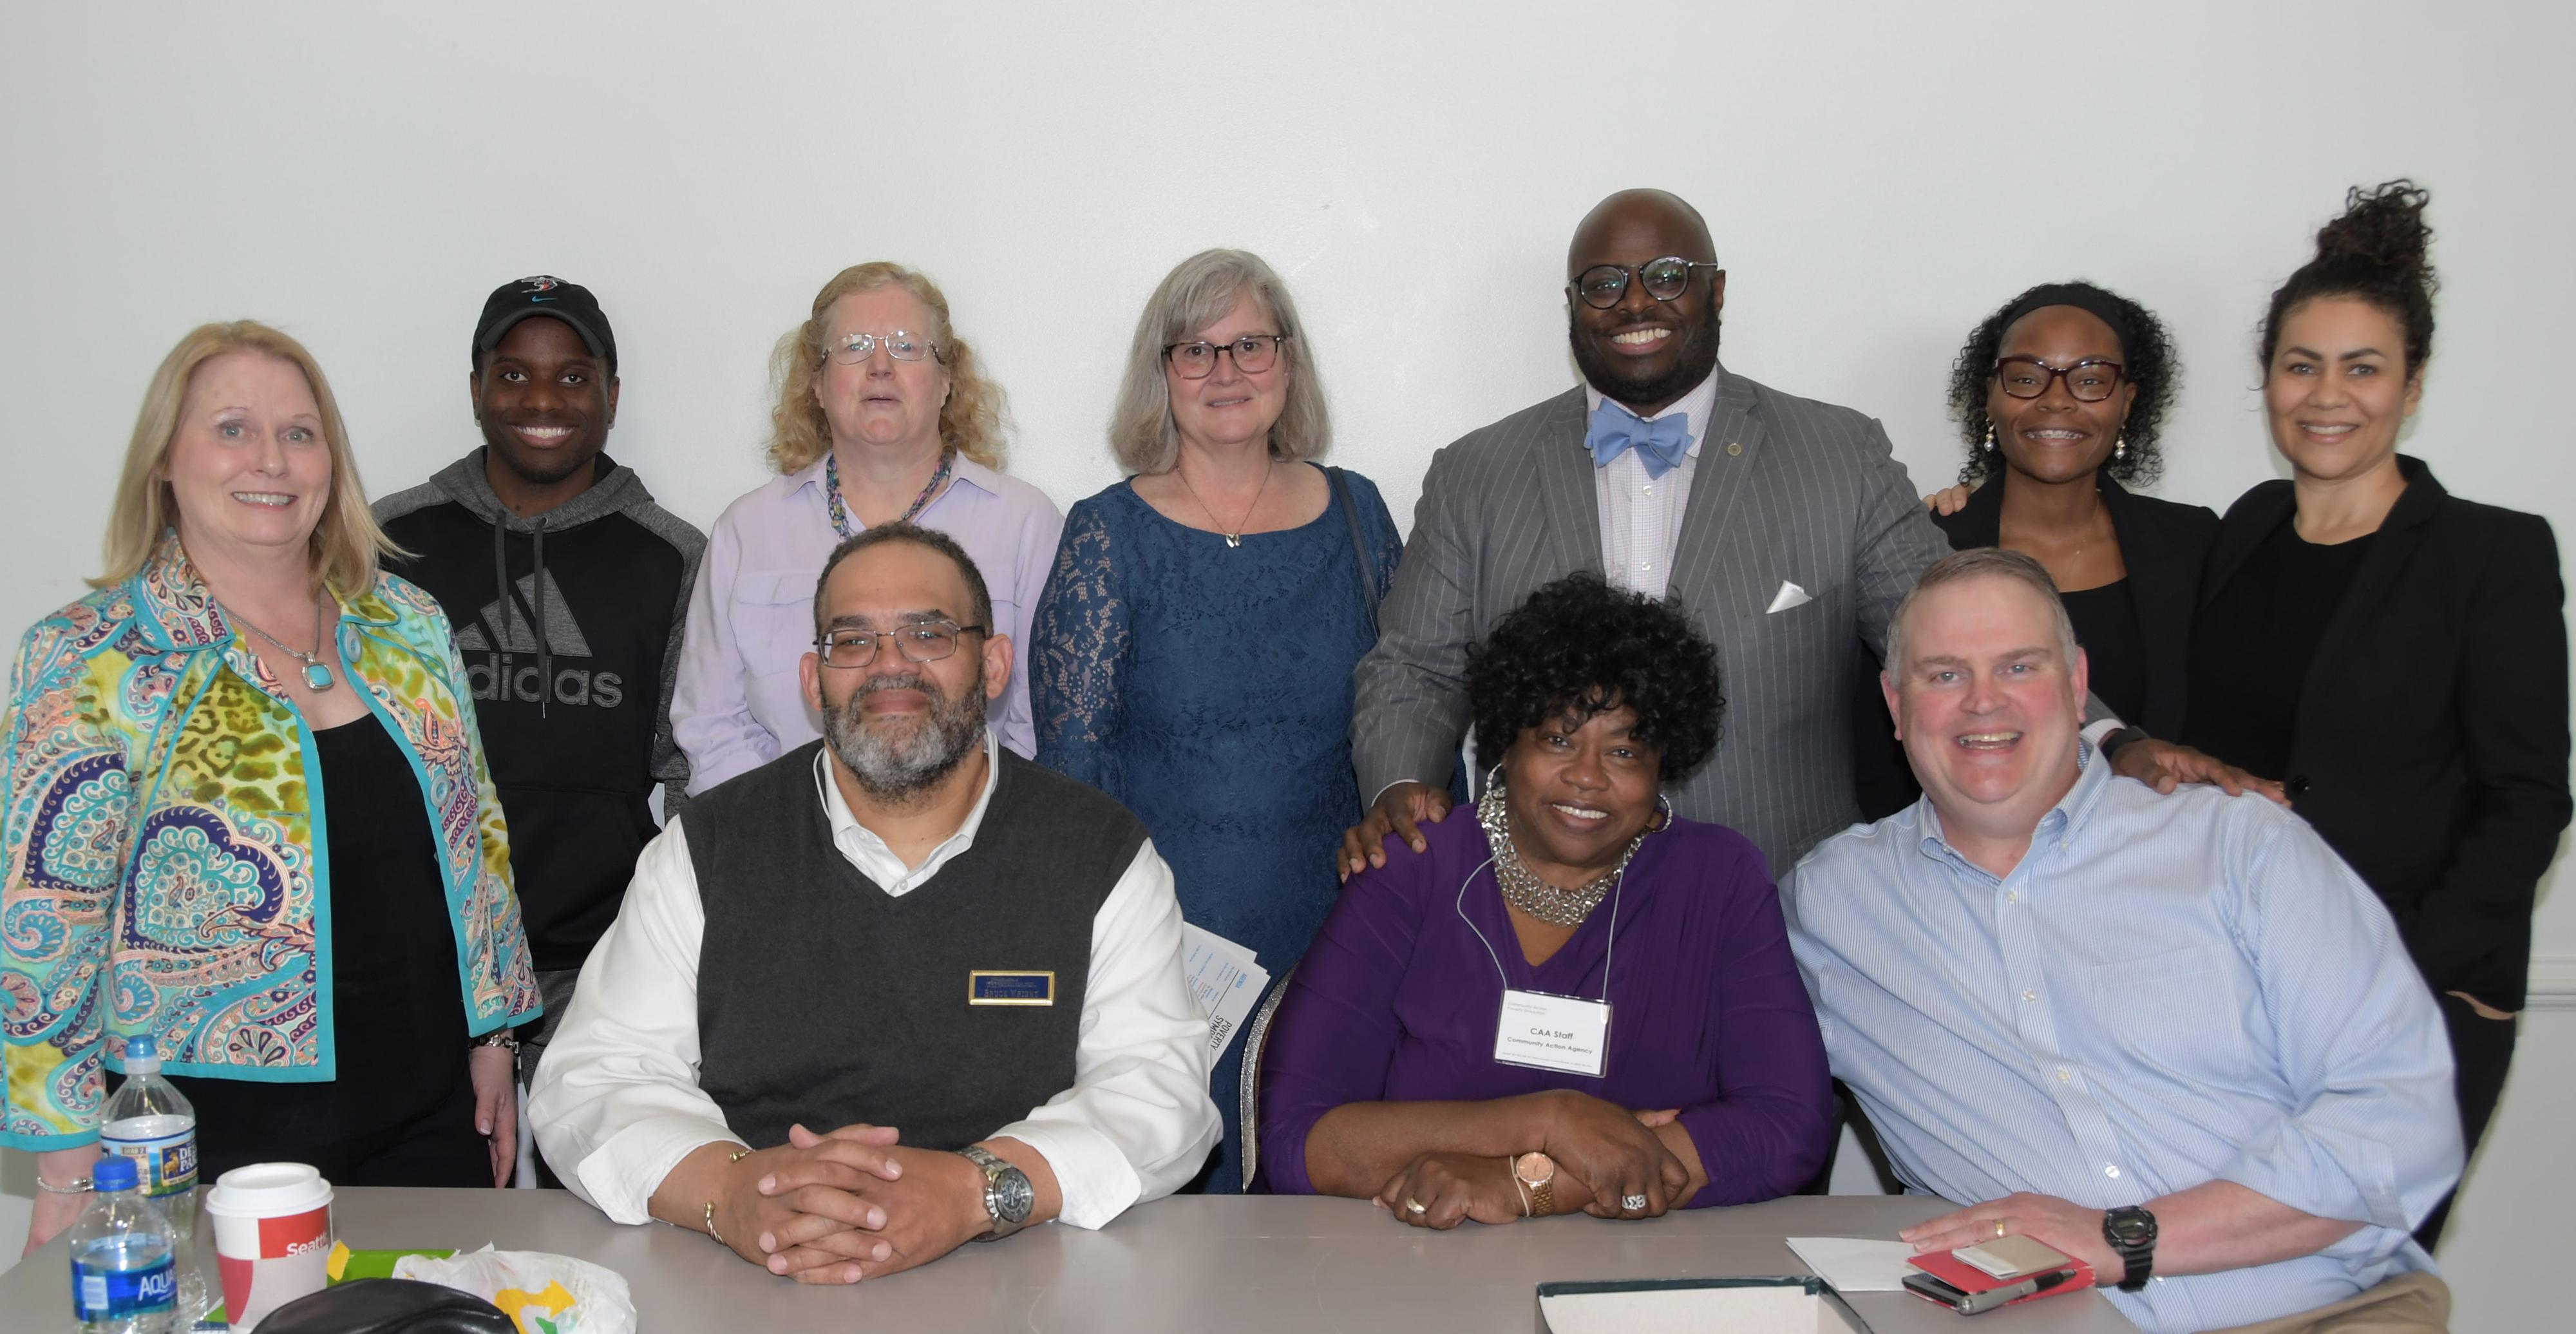 Poverty Symposium held on campus -- photos